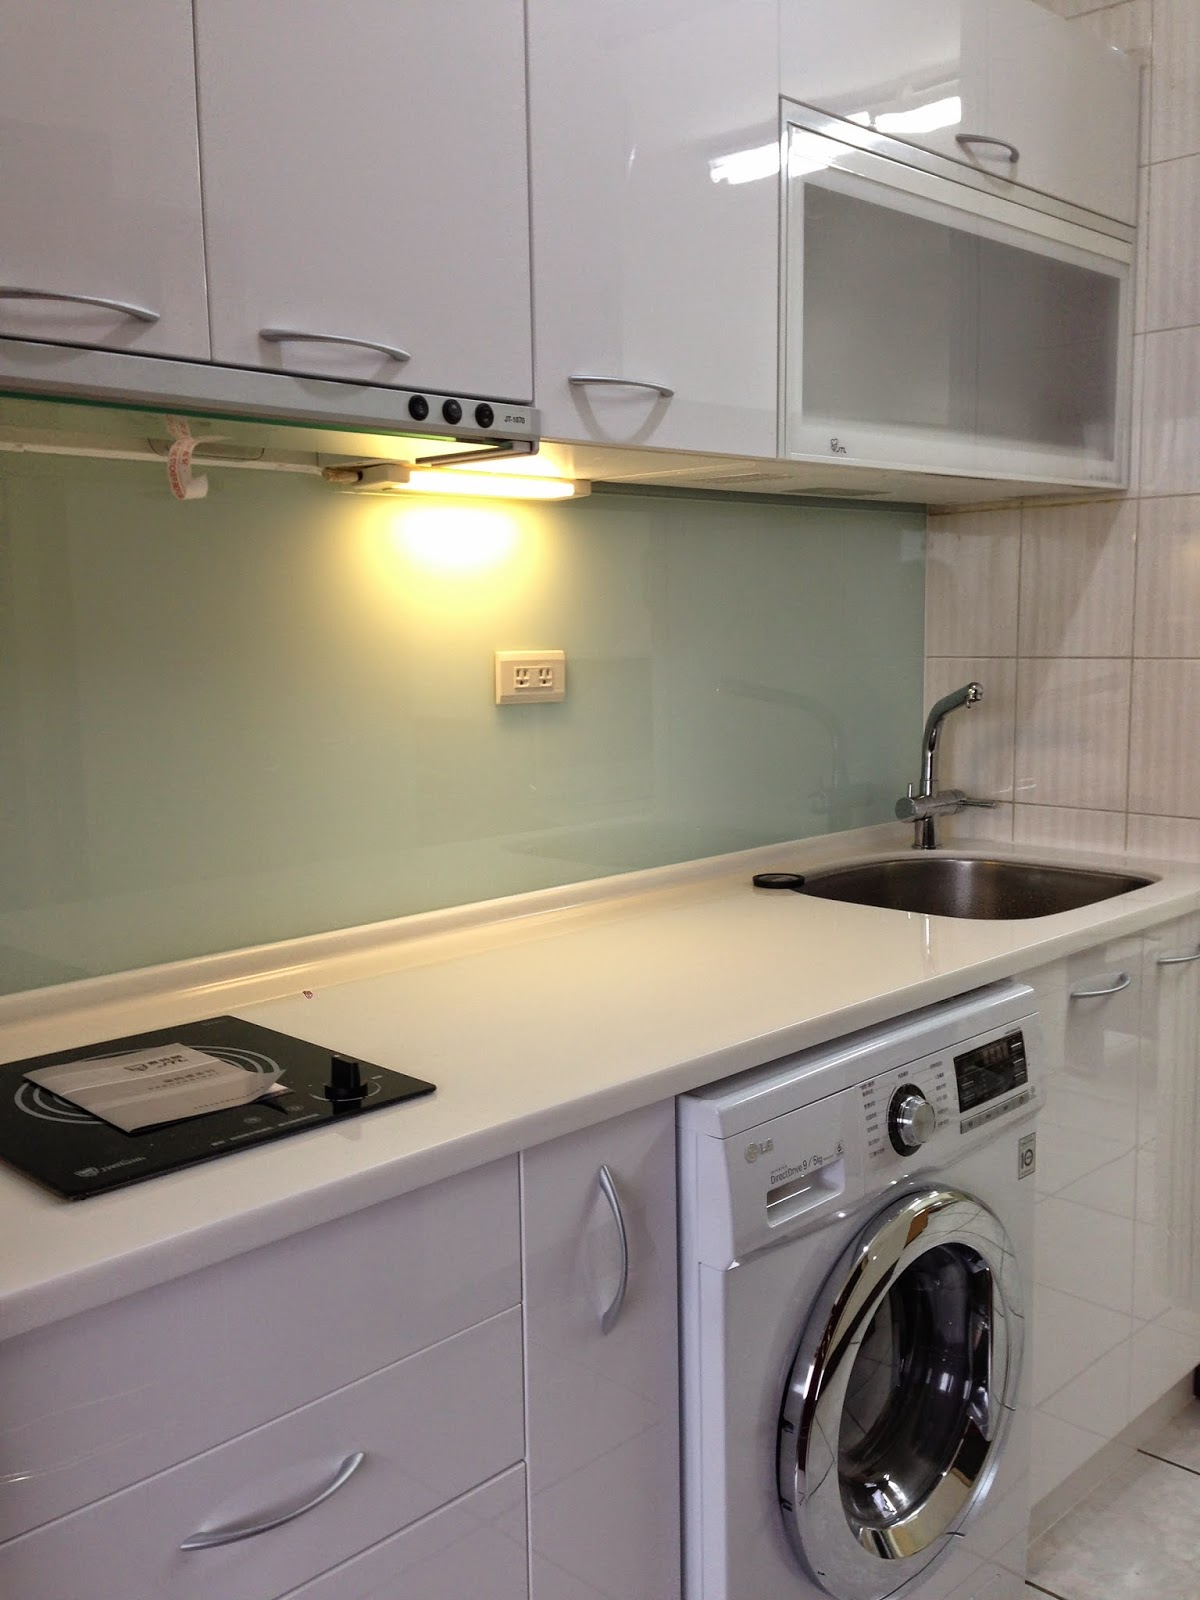 Lg Kitchen Suite Sink Plumbing 和禾廚房空間設計 作品集 小套房首選廚房 在廚具業打滾多年 也認識不少建設公司從業人員 此案是某建設公司的高階主管位於中正區的一間套房 因為是套房 所以將洗烘脫三合一機器內崁入廚具內 著實將只有210